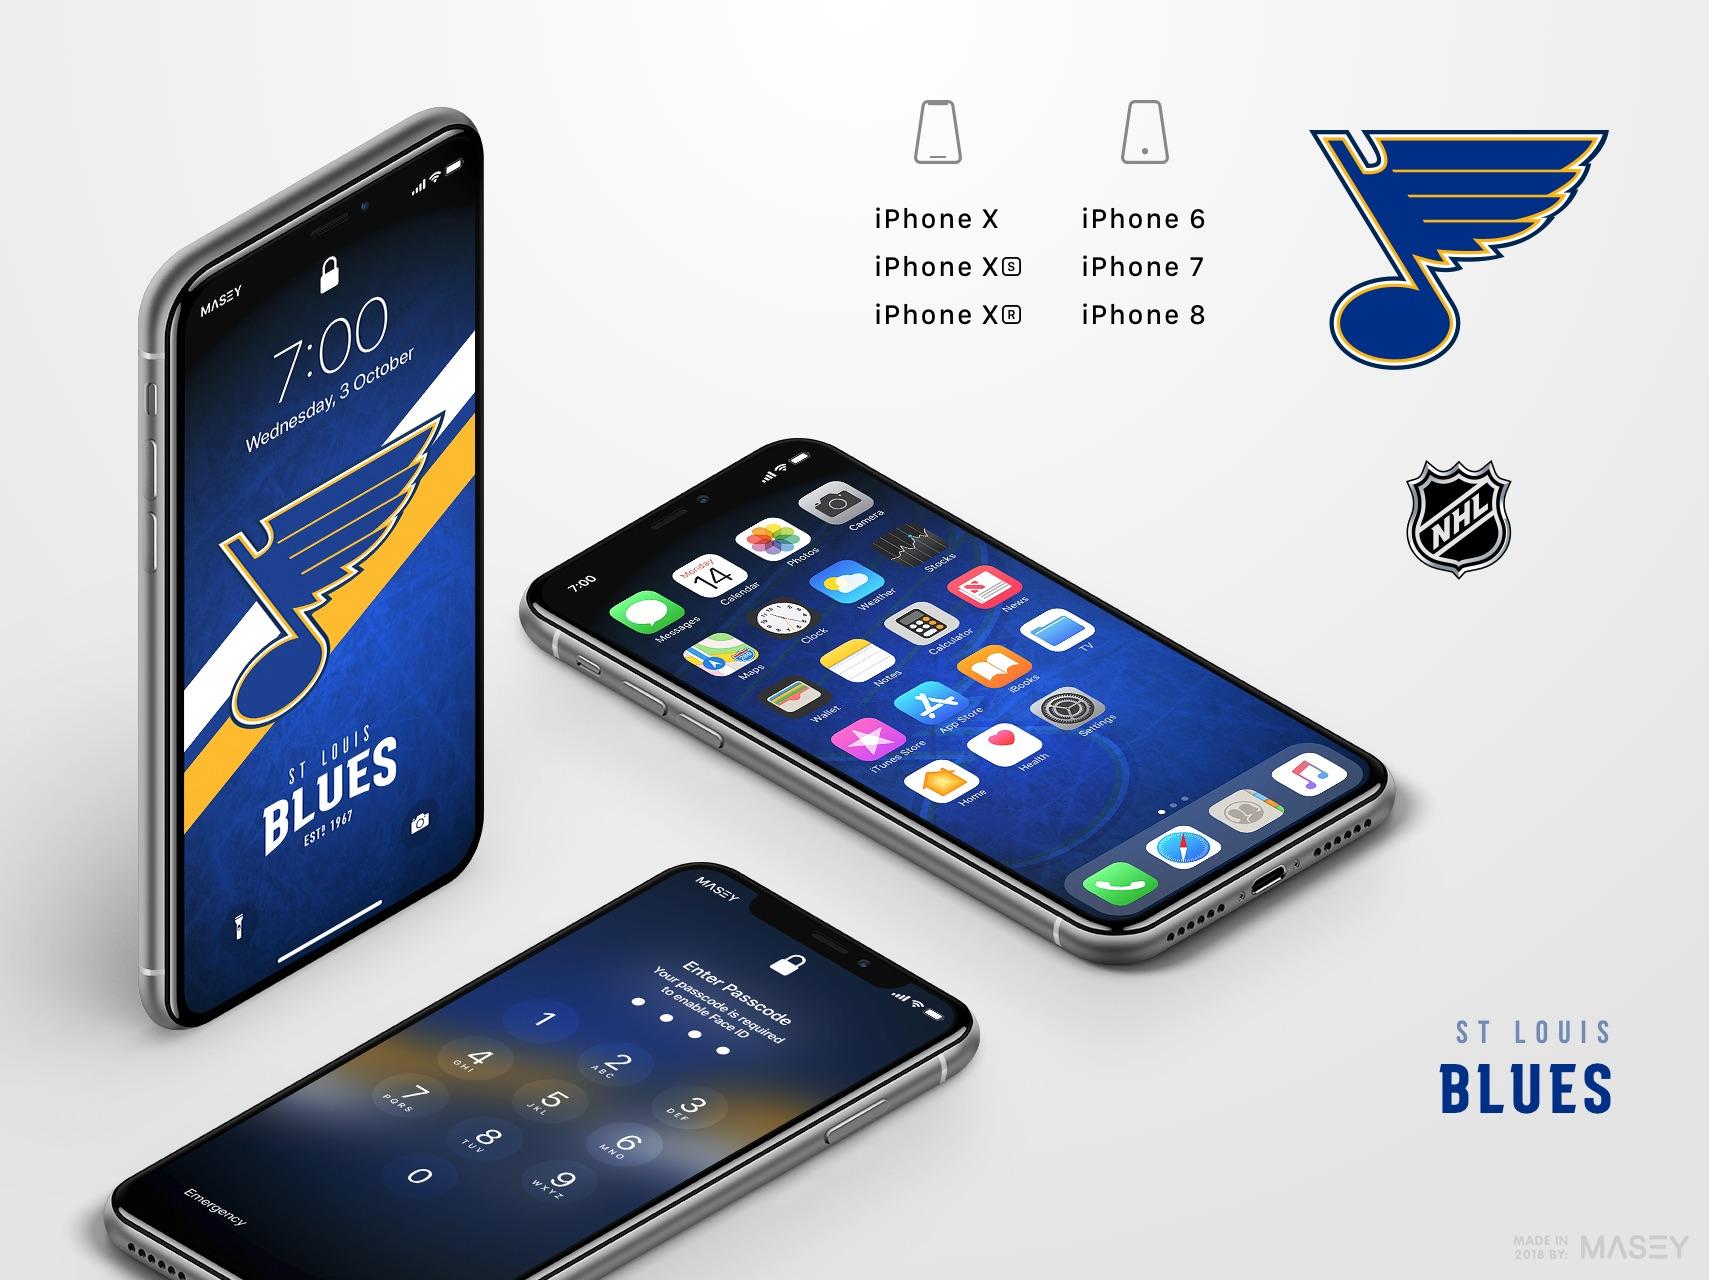 St Louis Blues iPhone Wallpaper